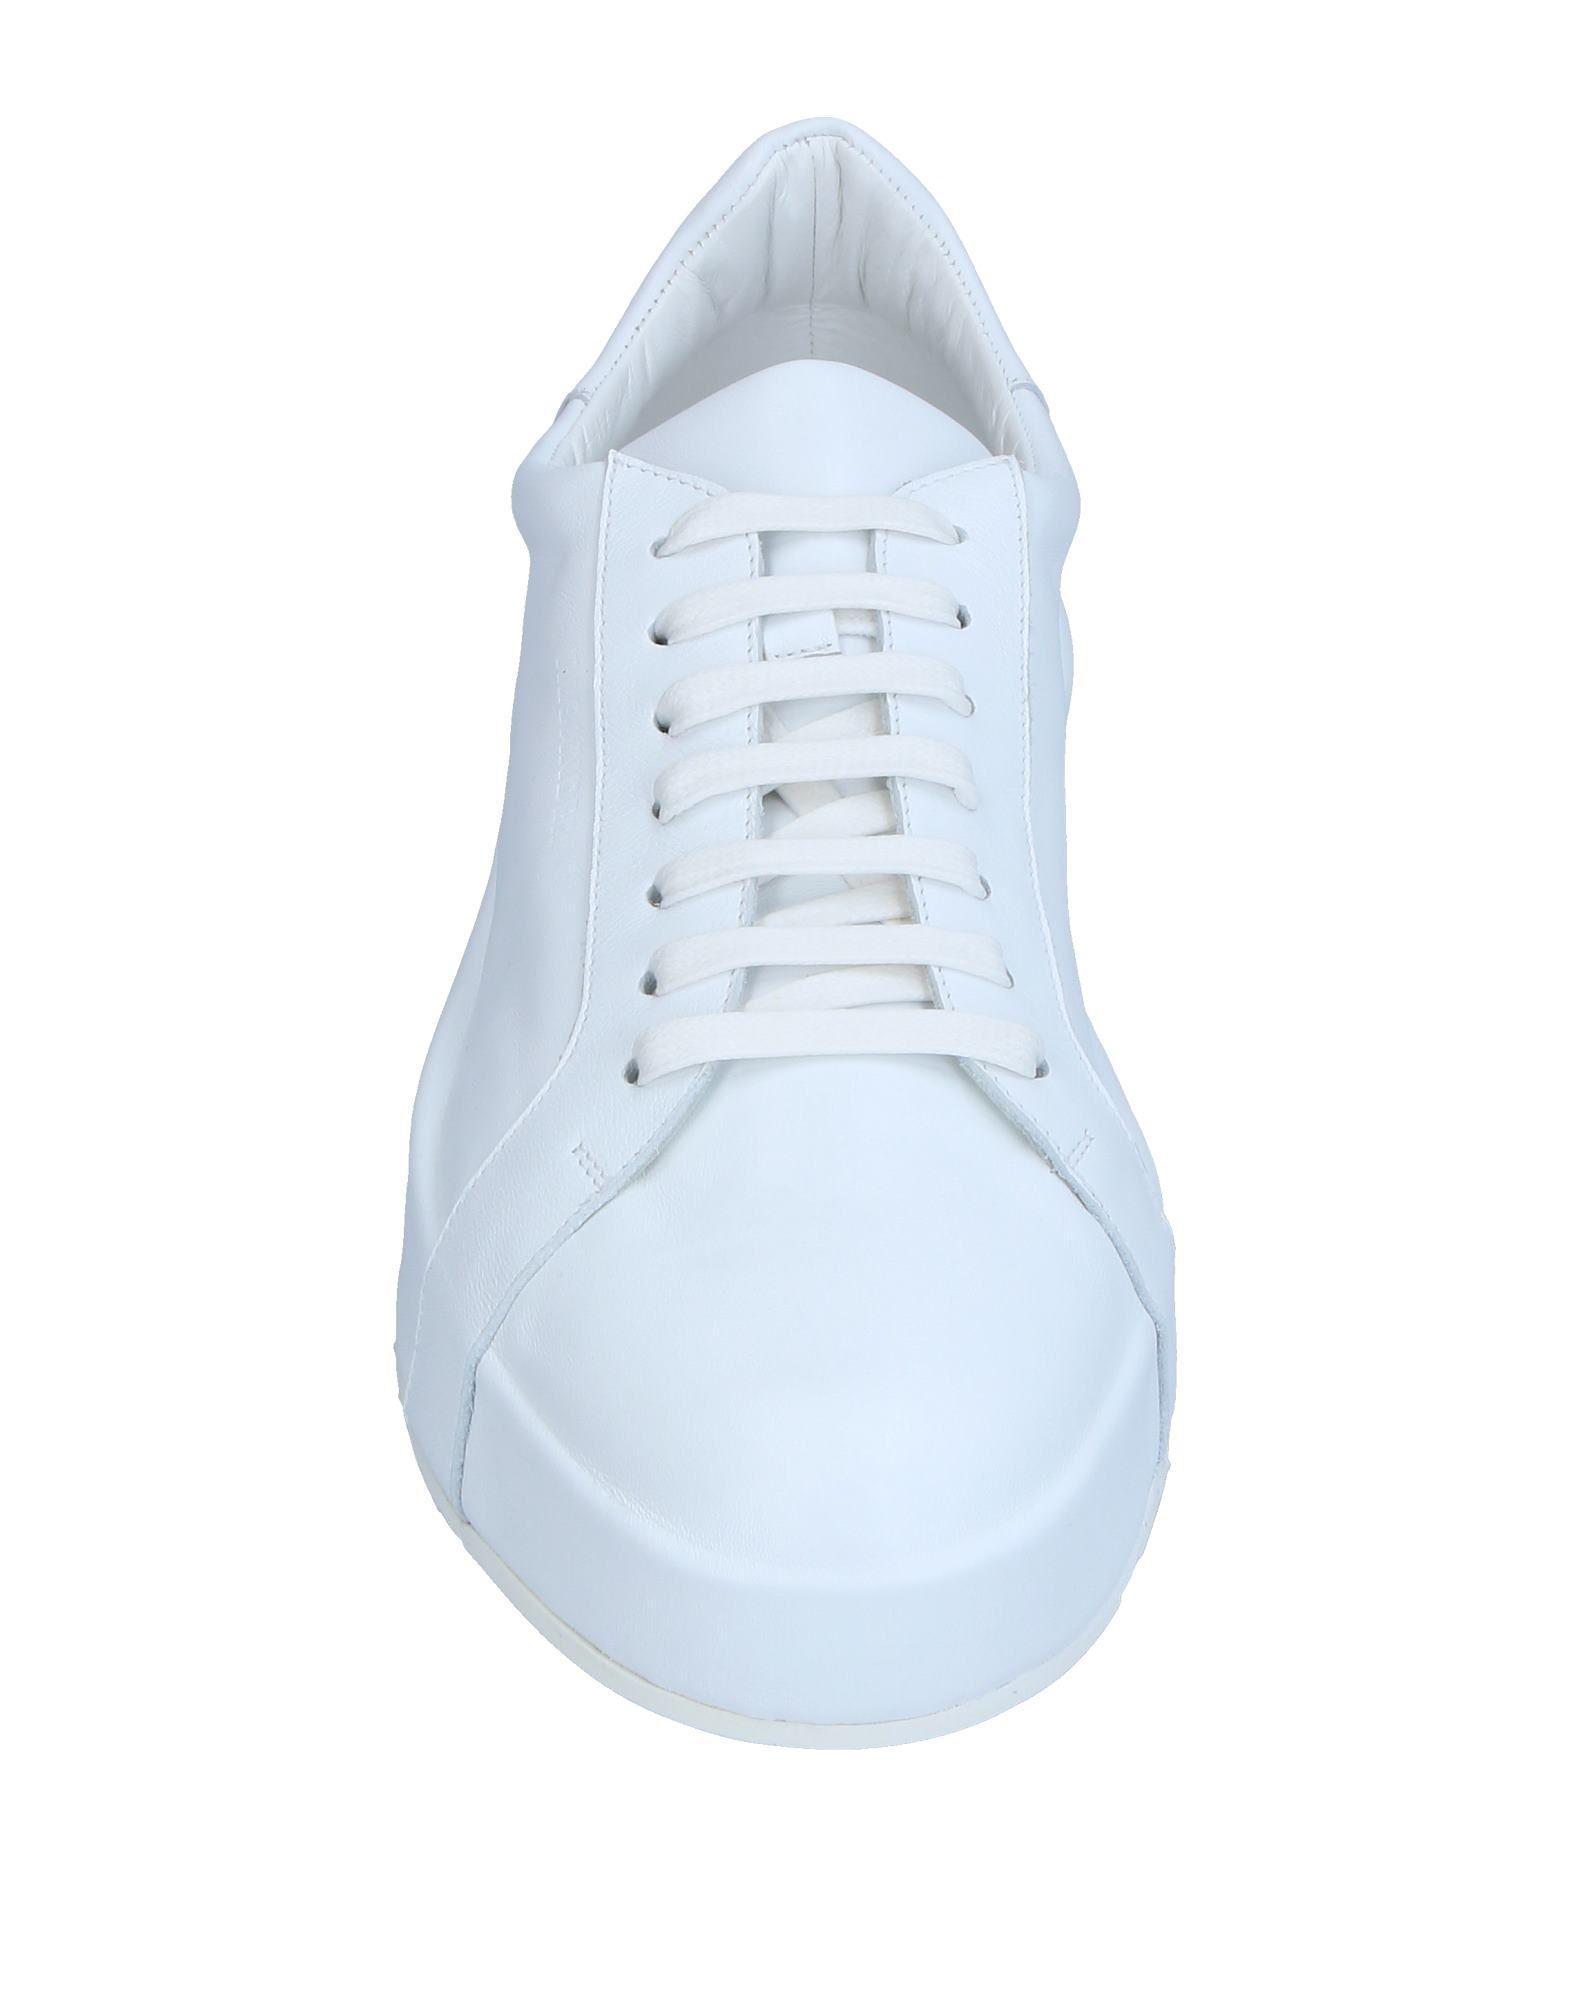 Jil Sander Leather Low-tops & Sneakers in White